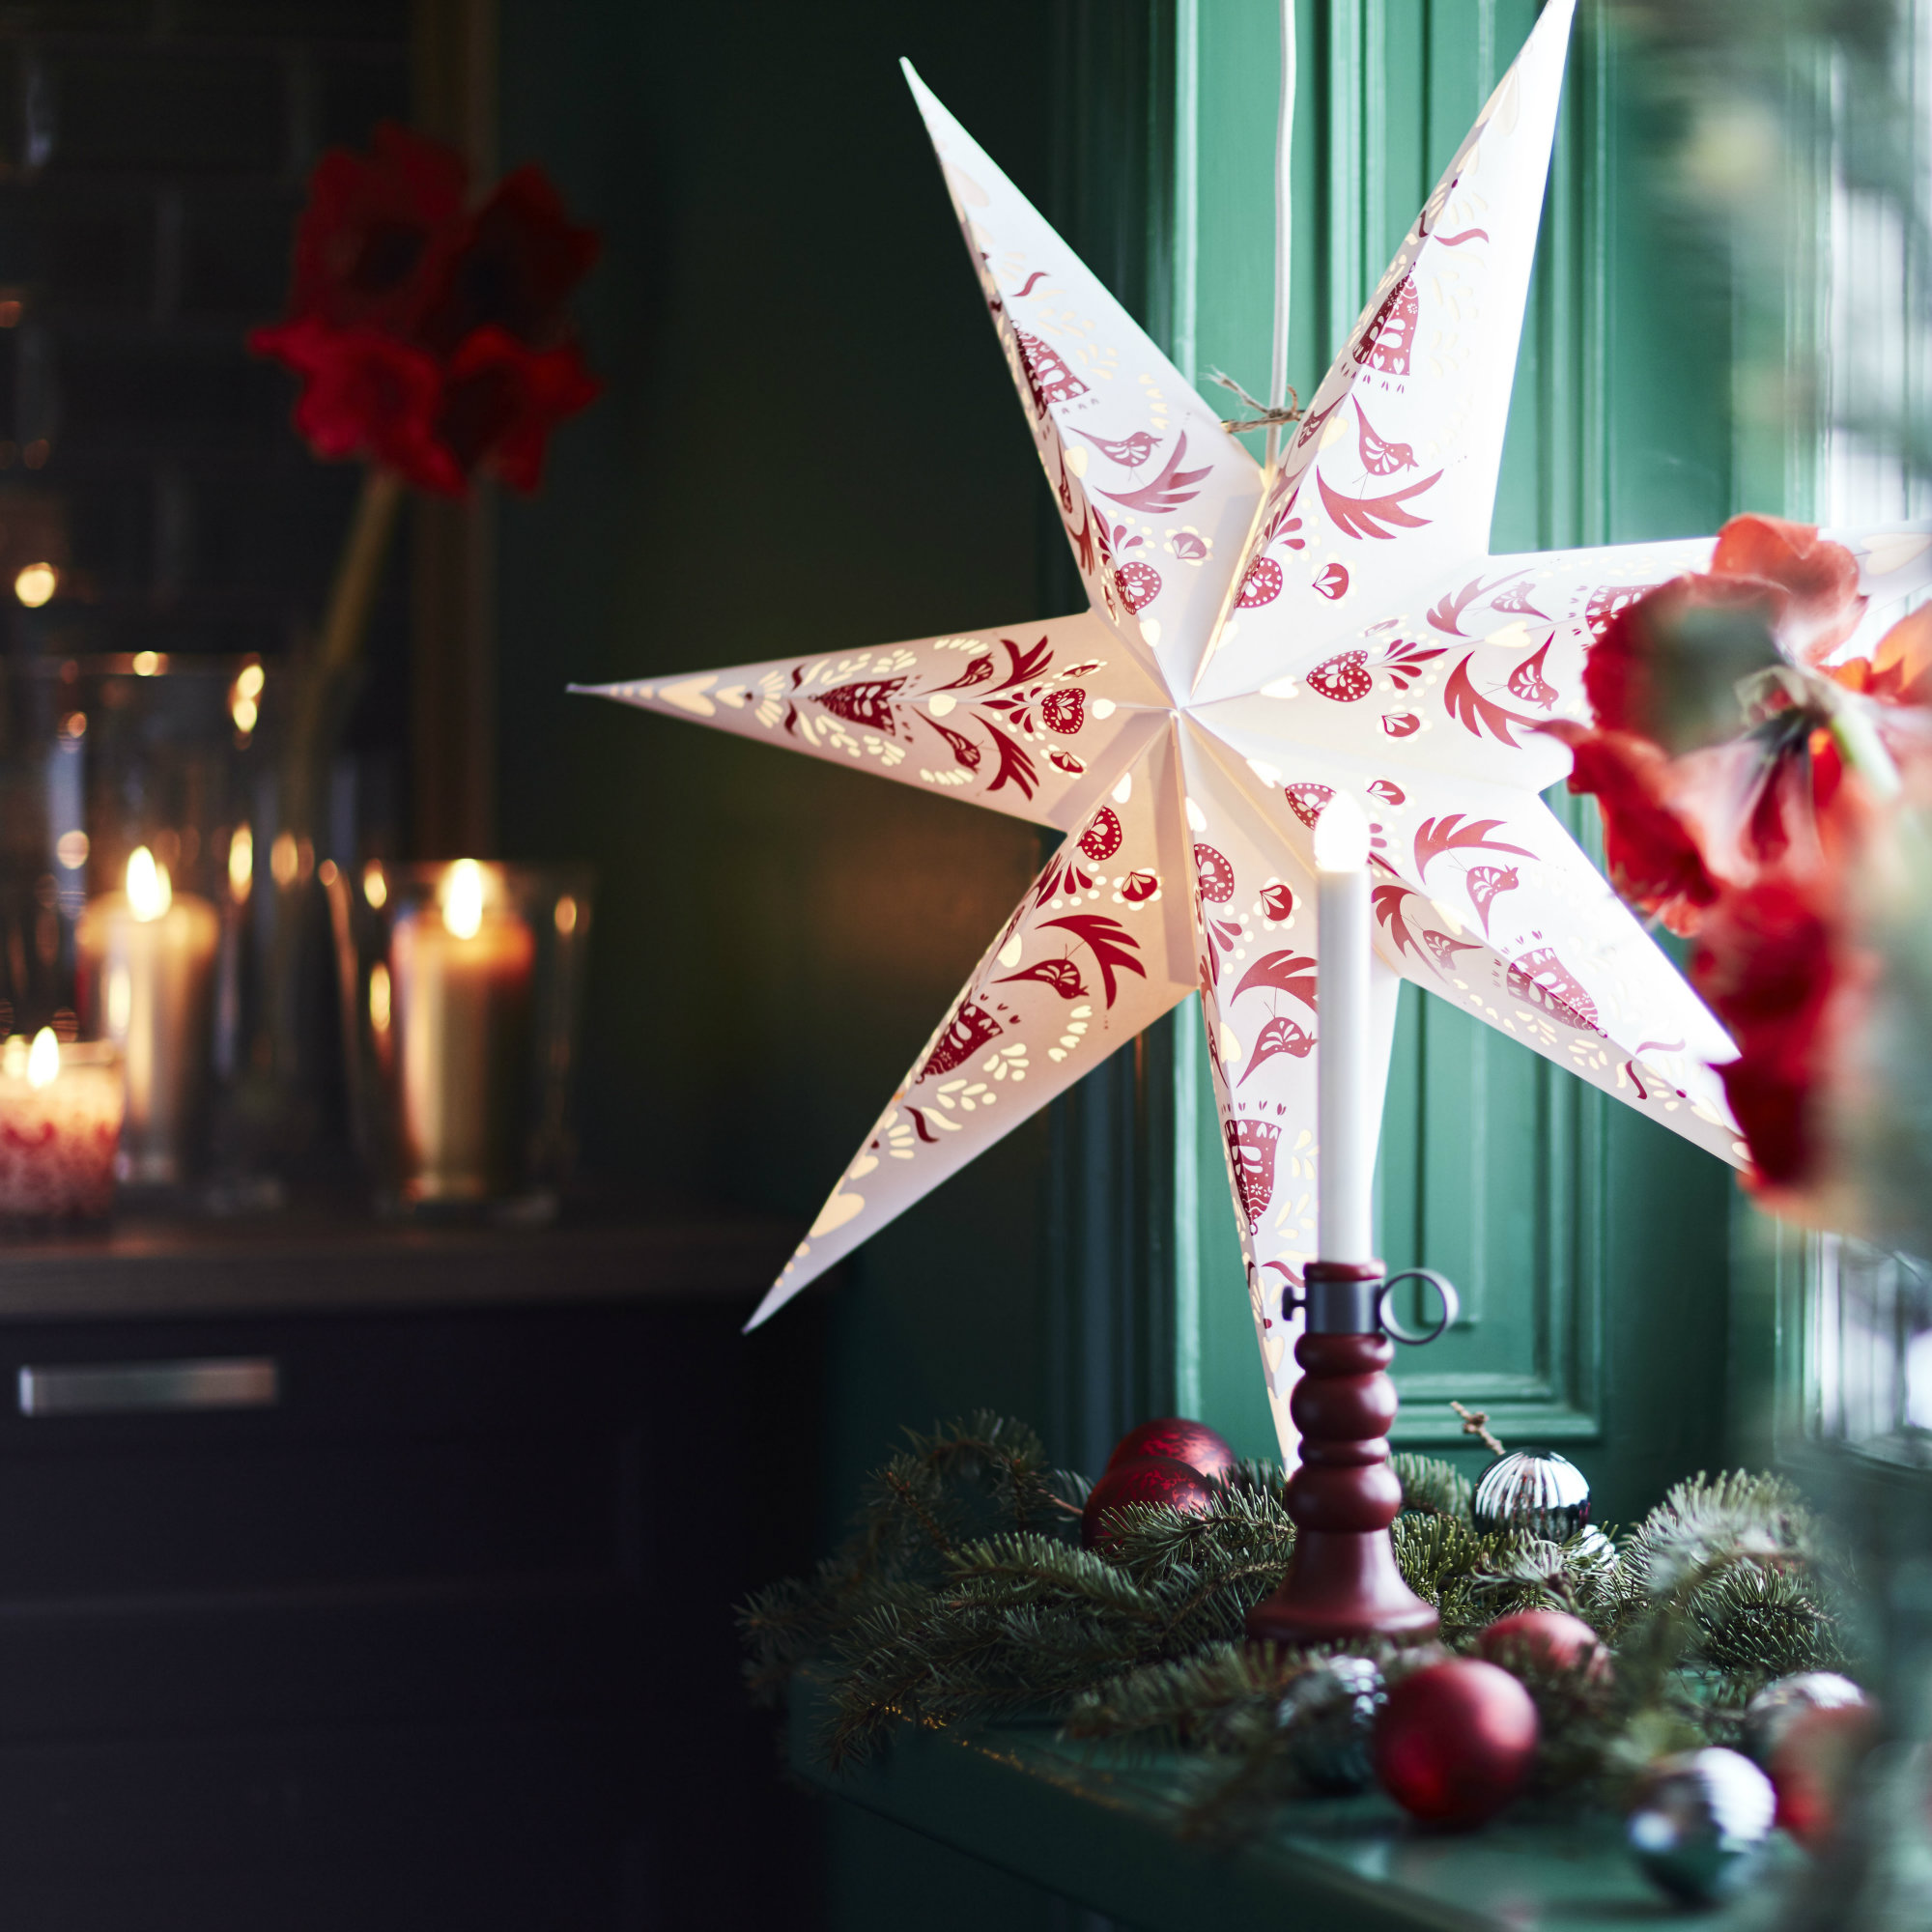 Kerstcollectie ikea 2016 traditionele zweedse folklore - Ikea weihnachtsdeko 2017 ...